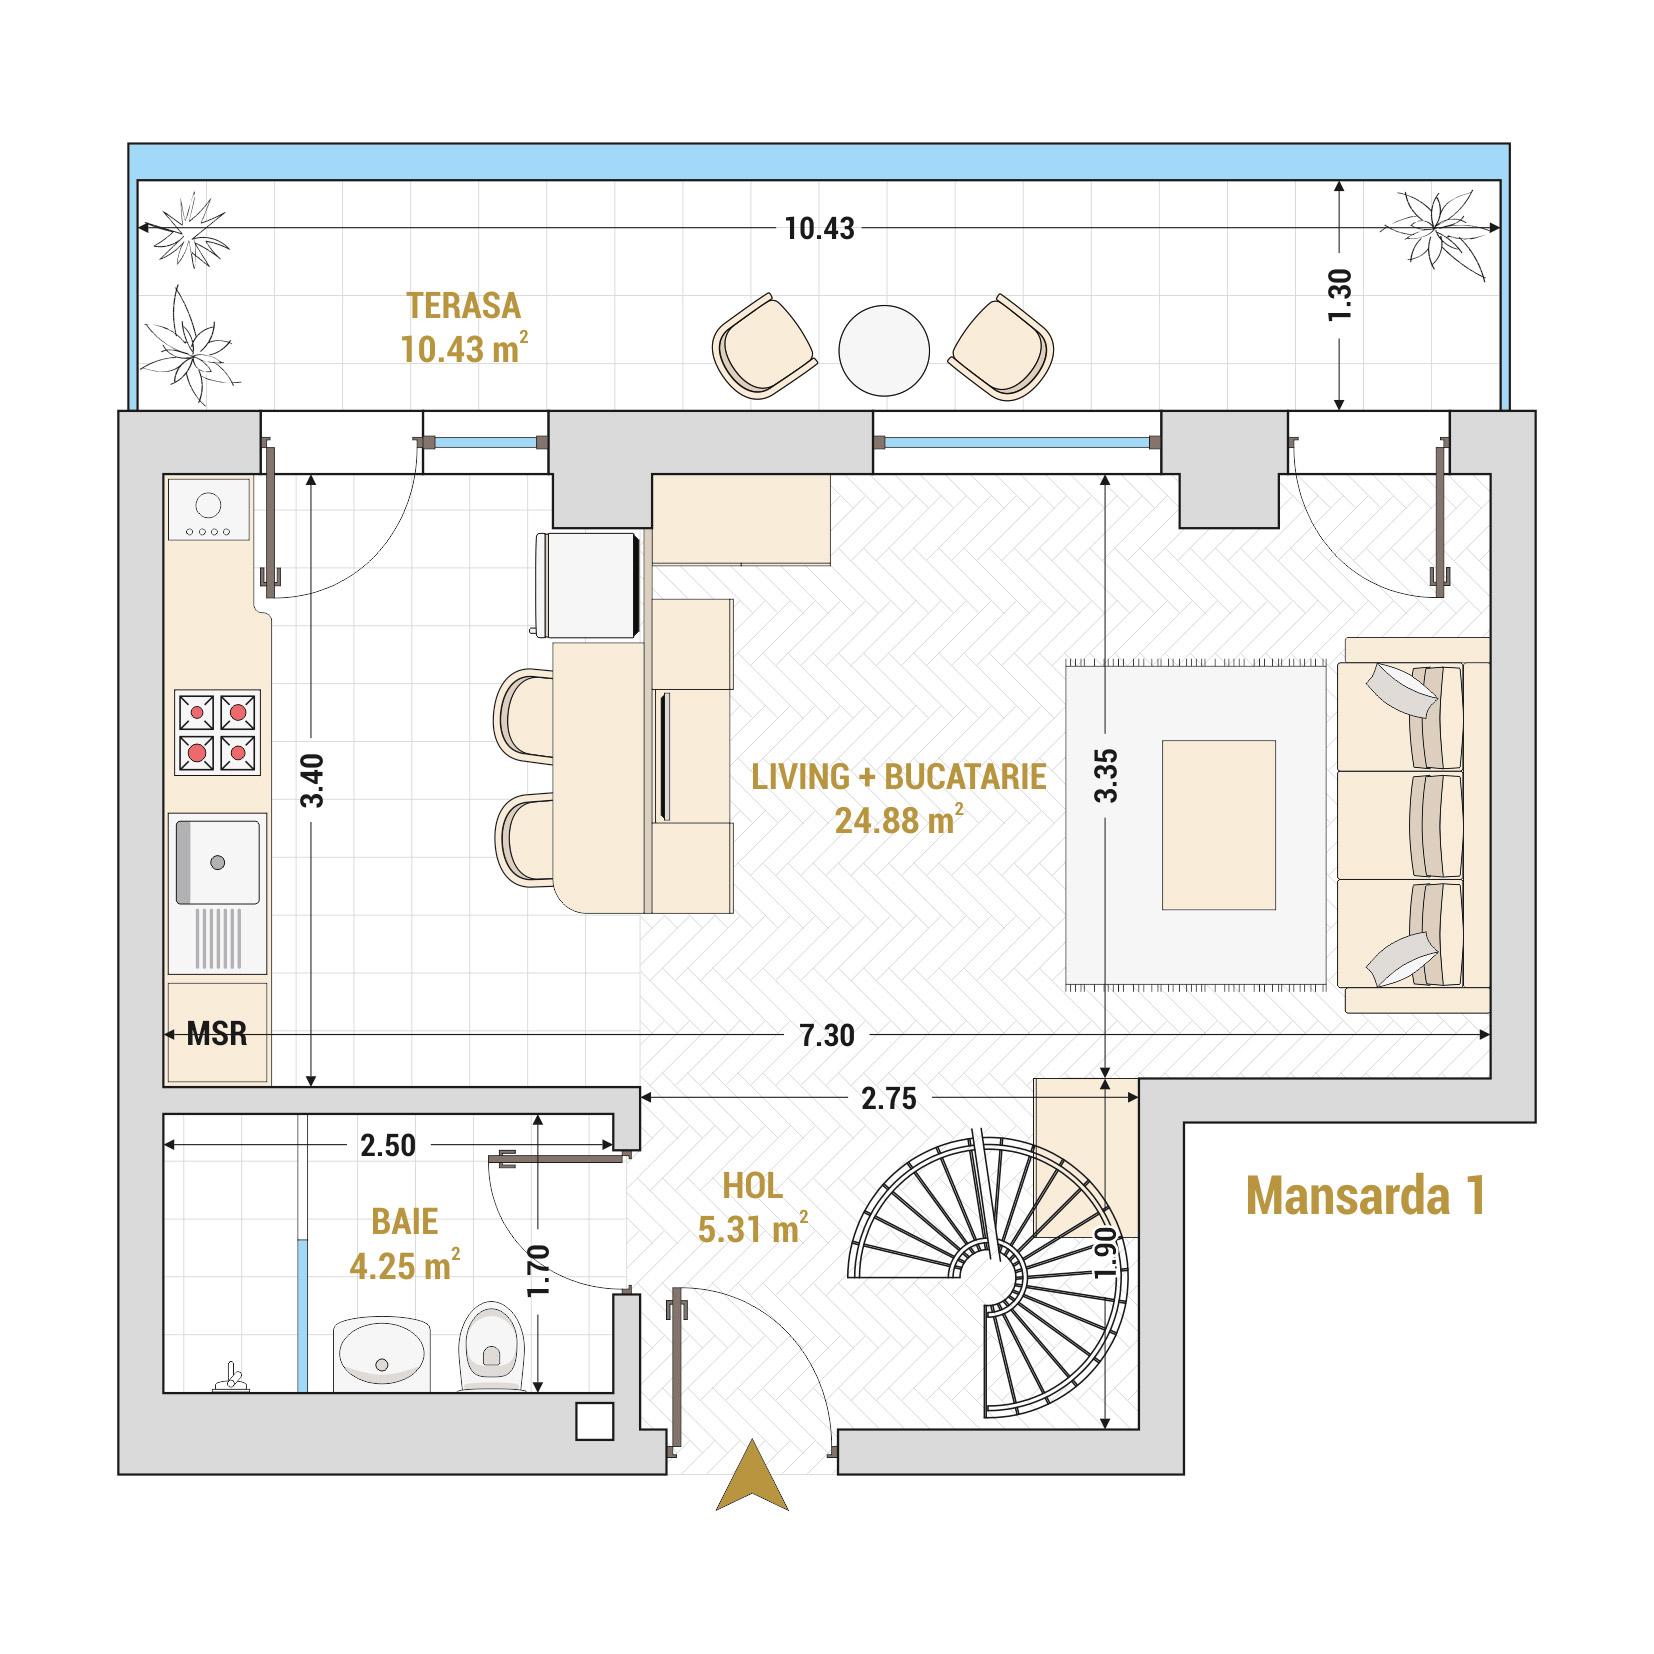 Duplex cu 2 camere de vanzare Bucuresti - Catedral Residence - Marriott, Piata Unirii, 13 Septembrie, Izvor - Tip 2 - T1A - A